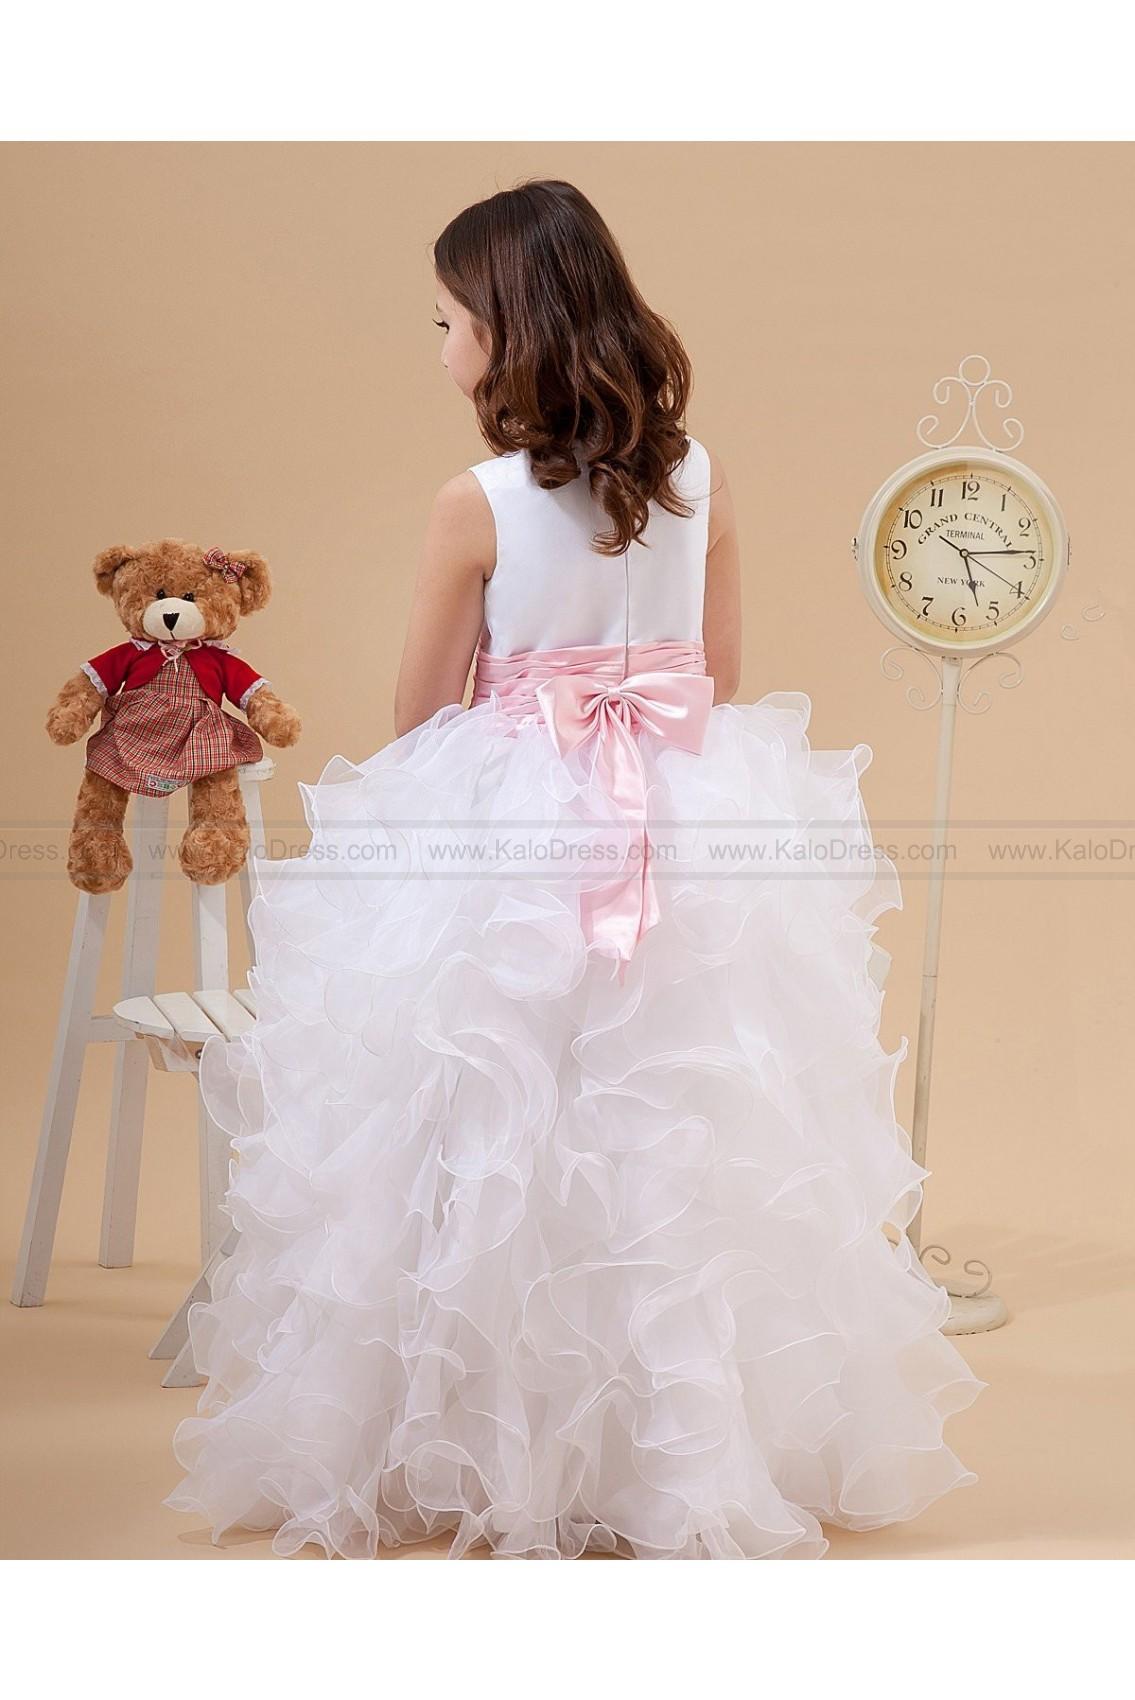 Multi Layers Hem Satin Organza Flower Girl Dresses - Flower Girl Dresses 2014 - Wedding Party Dresses